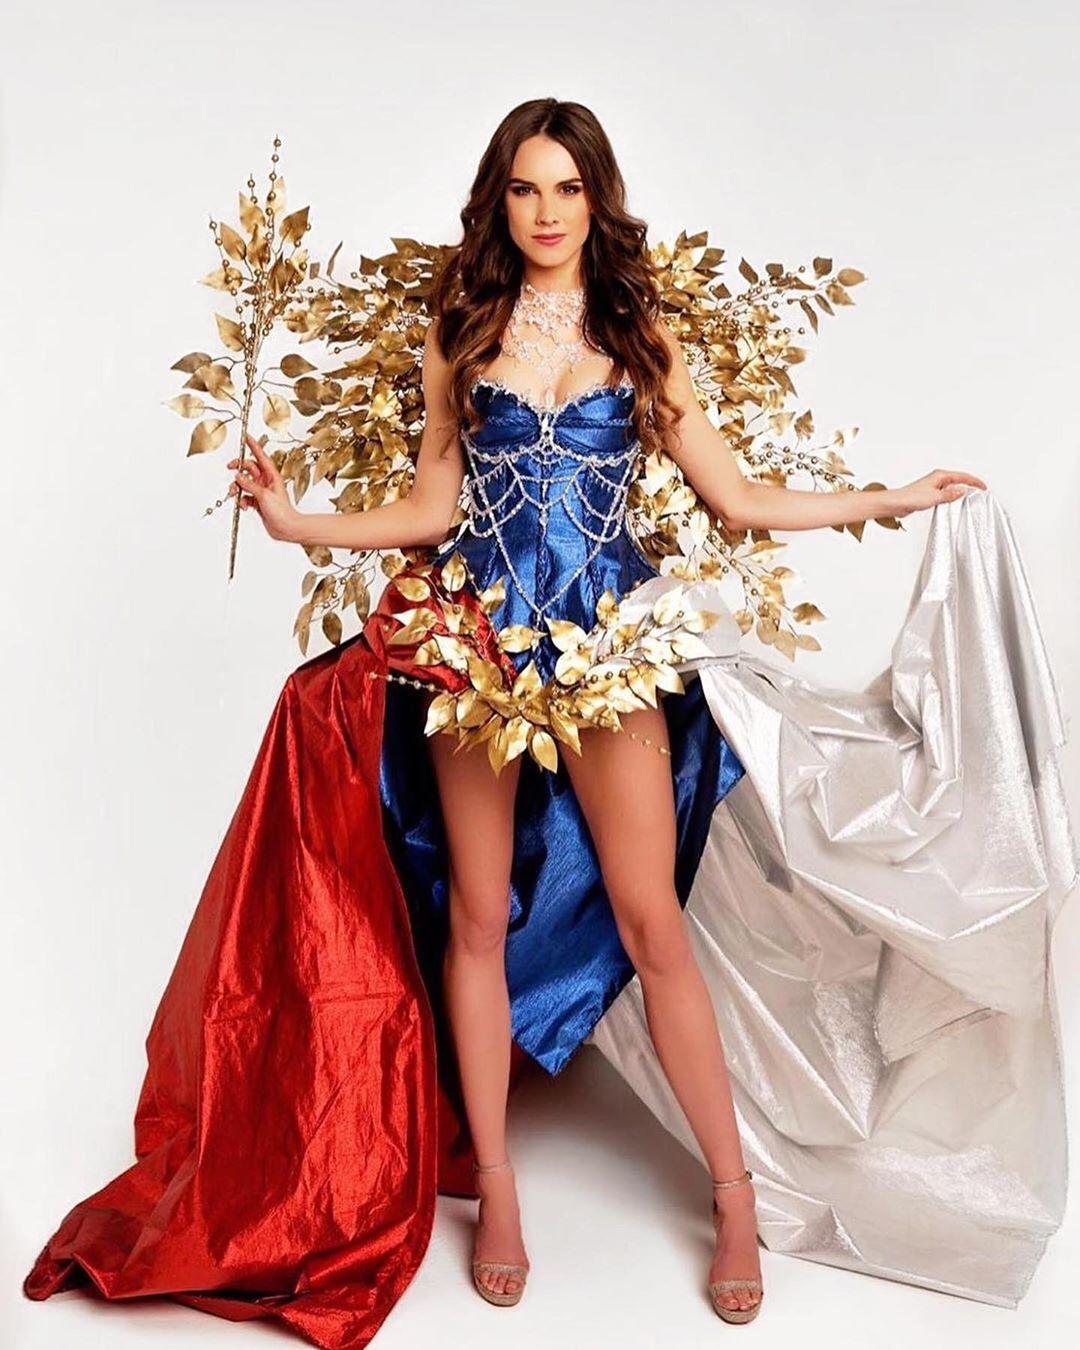 trajes tipicos de candidatas a miss universe 2019. Iunuqo